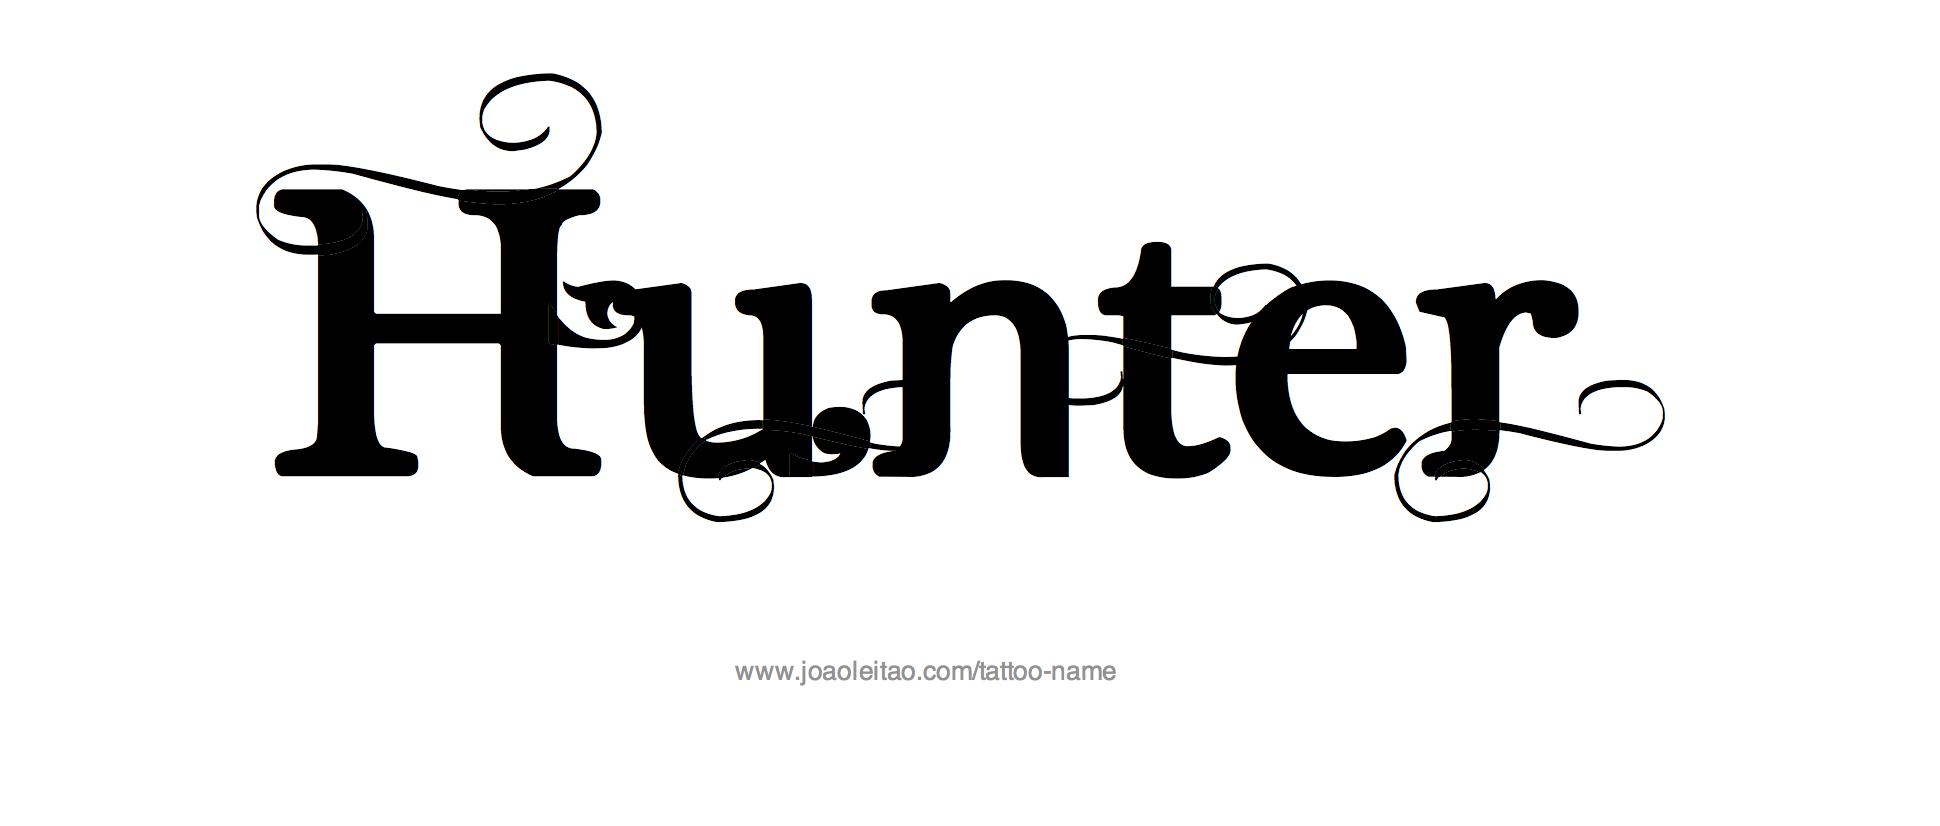 Hunter Name Tattoo Designs.